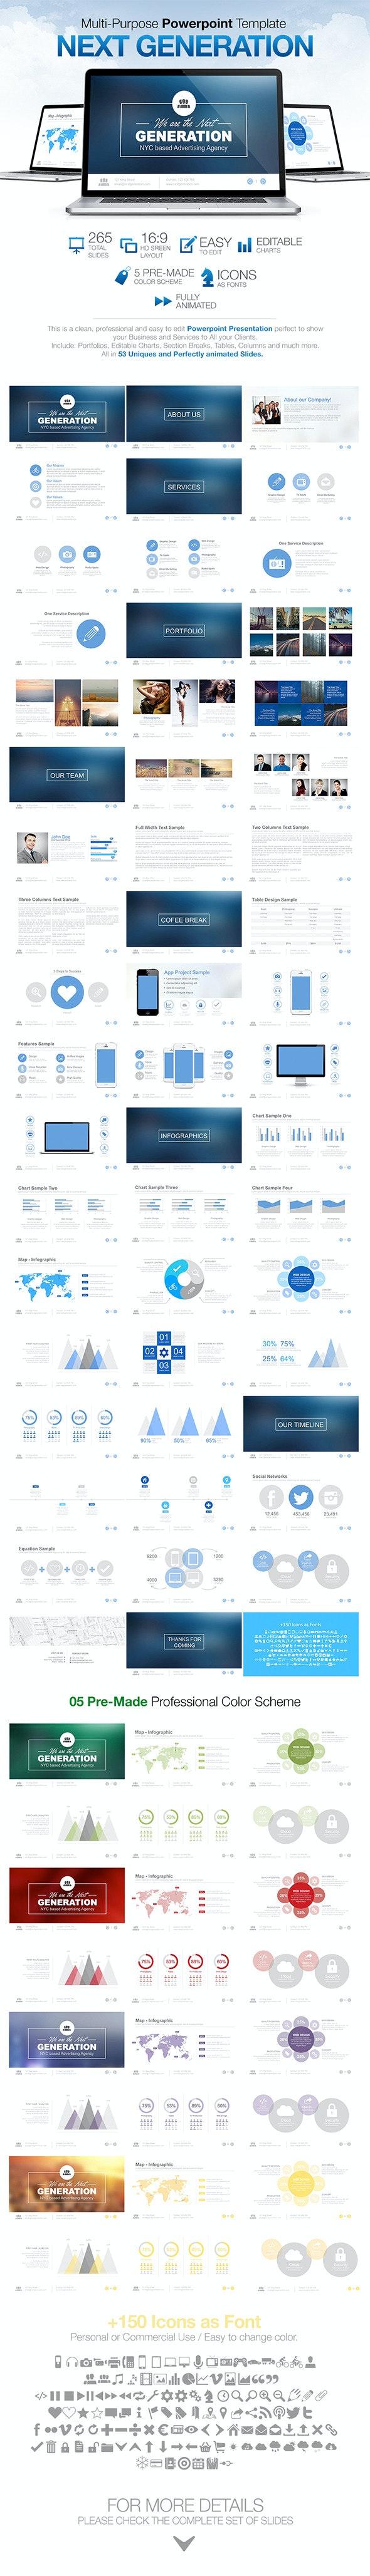 Next Generation - Powerpoint - PowerPoint Templates Presentation Templates